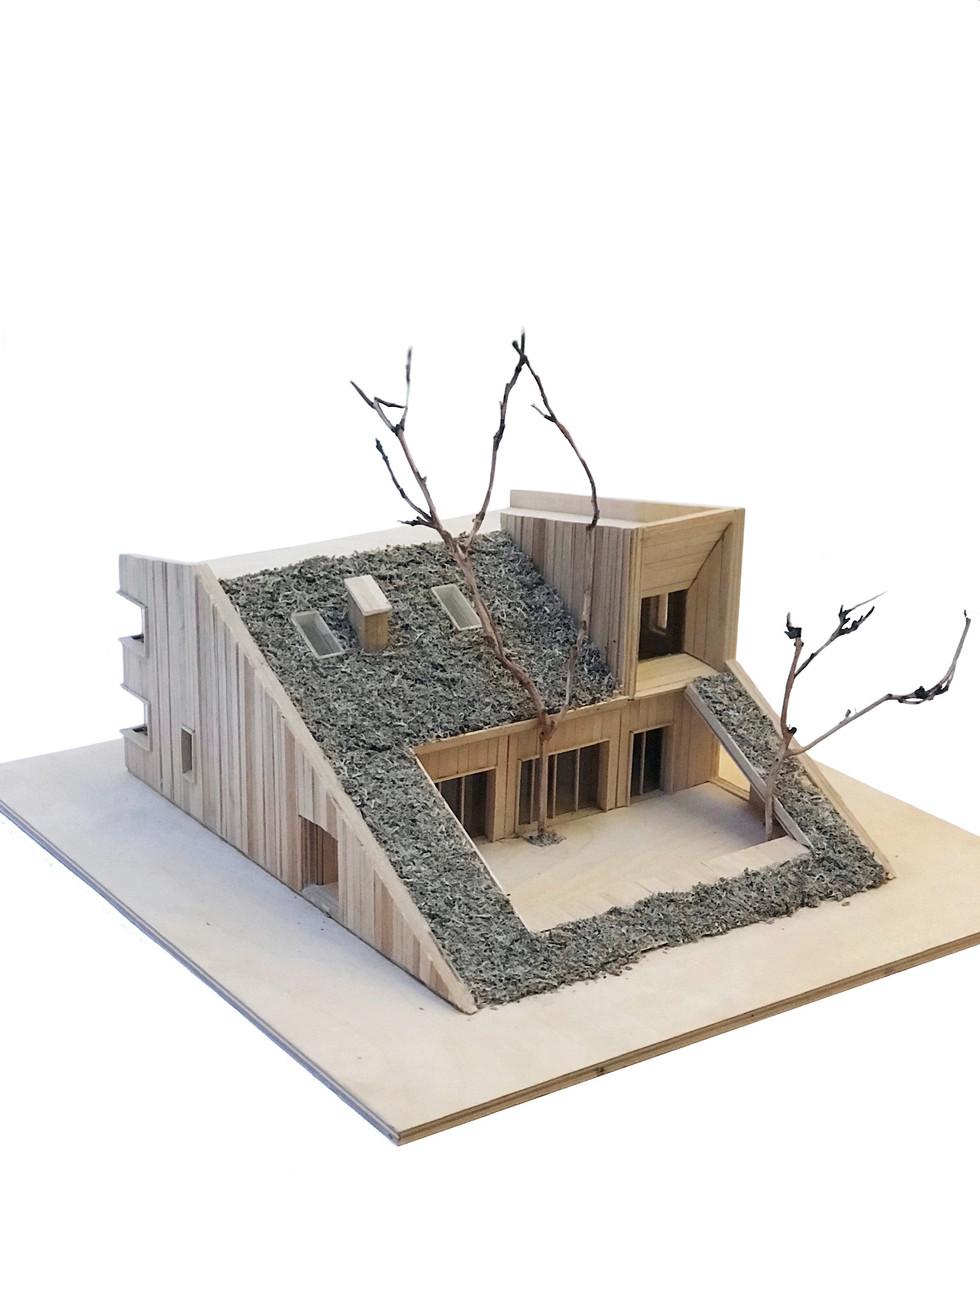 hill-house-model_1-_-by-snegiri-ar